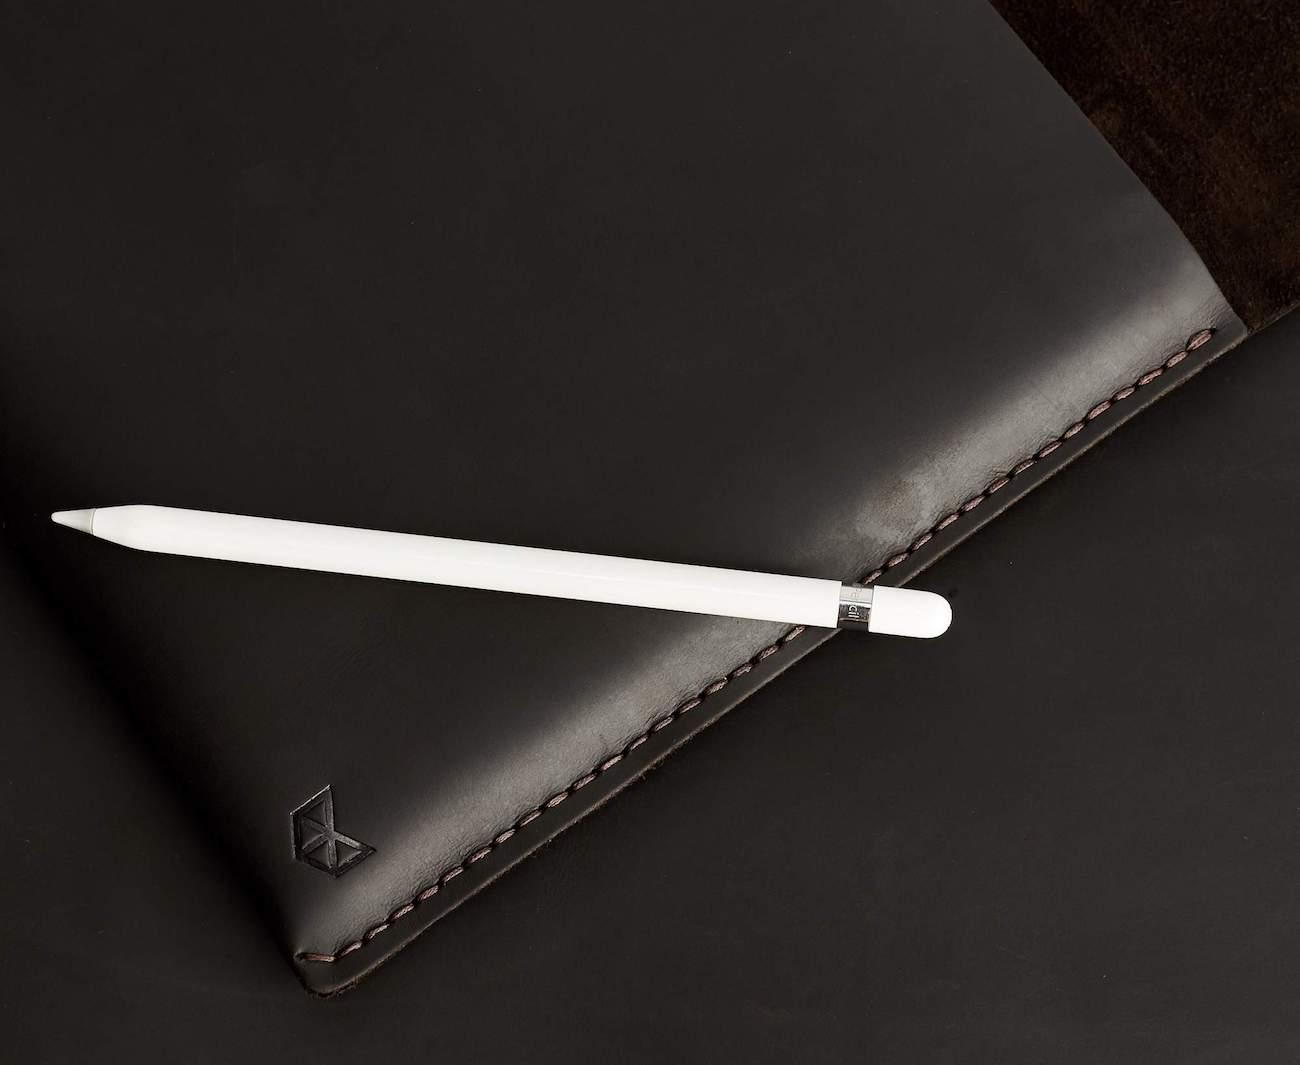 Draftsman+2+Leather+iPad+Case